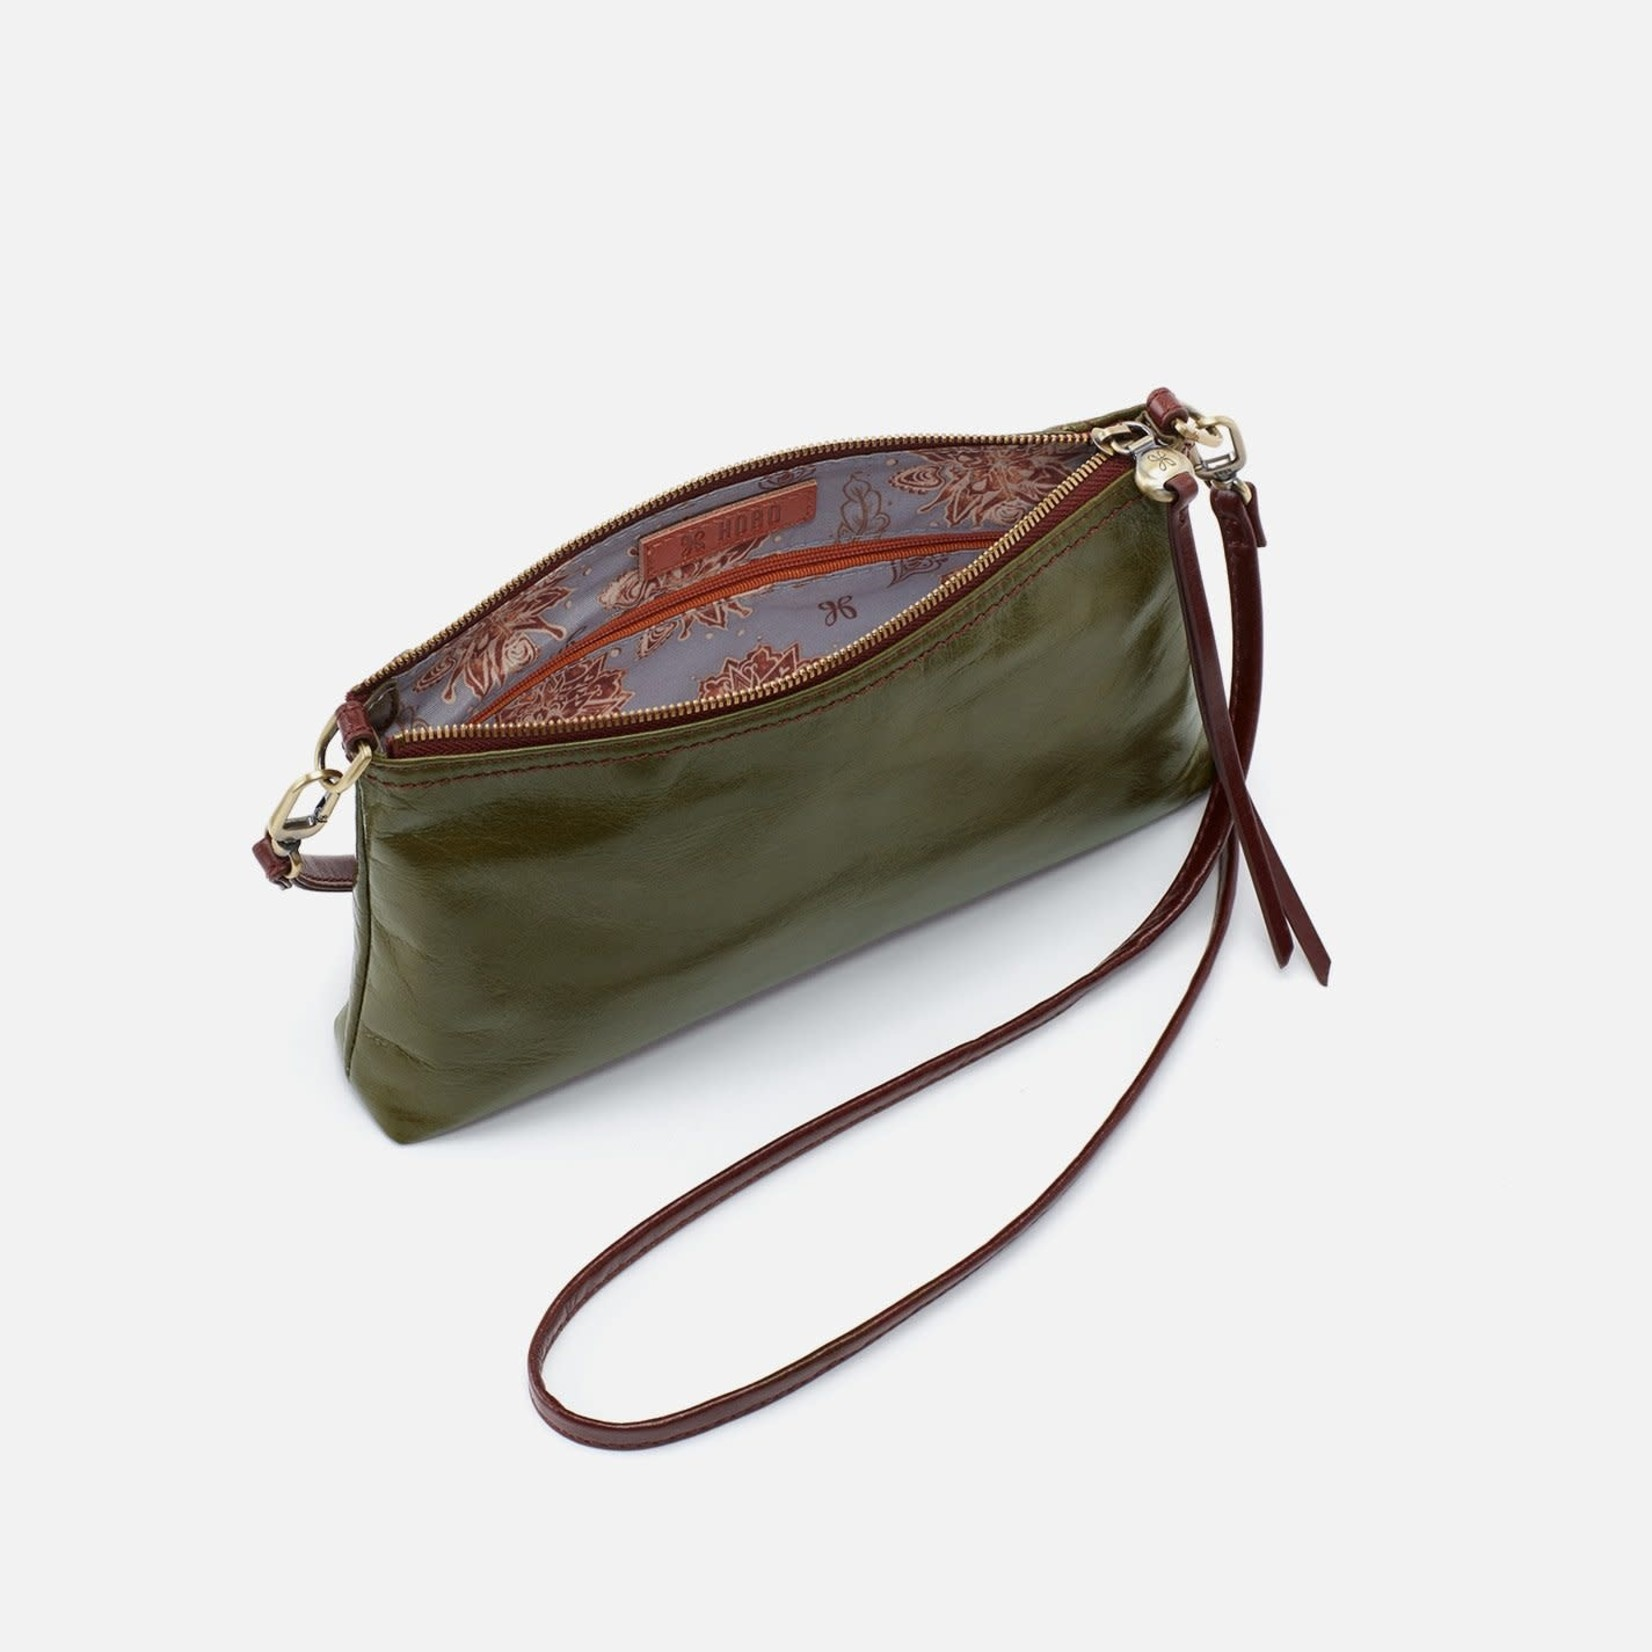 HOBO Darcy Moss Vintage Hide Leather Wristlet/Crossbody